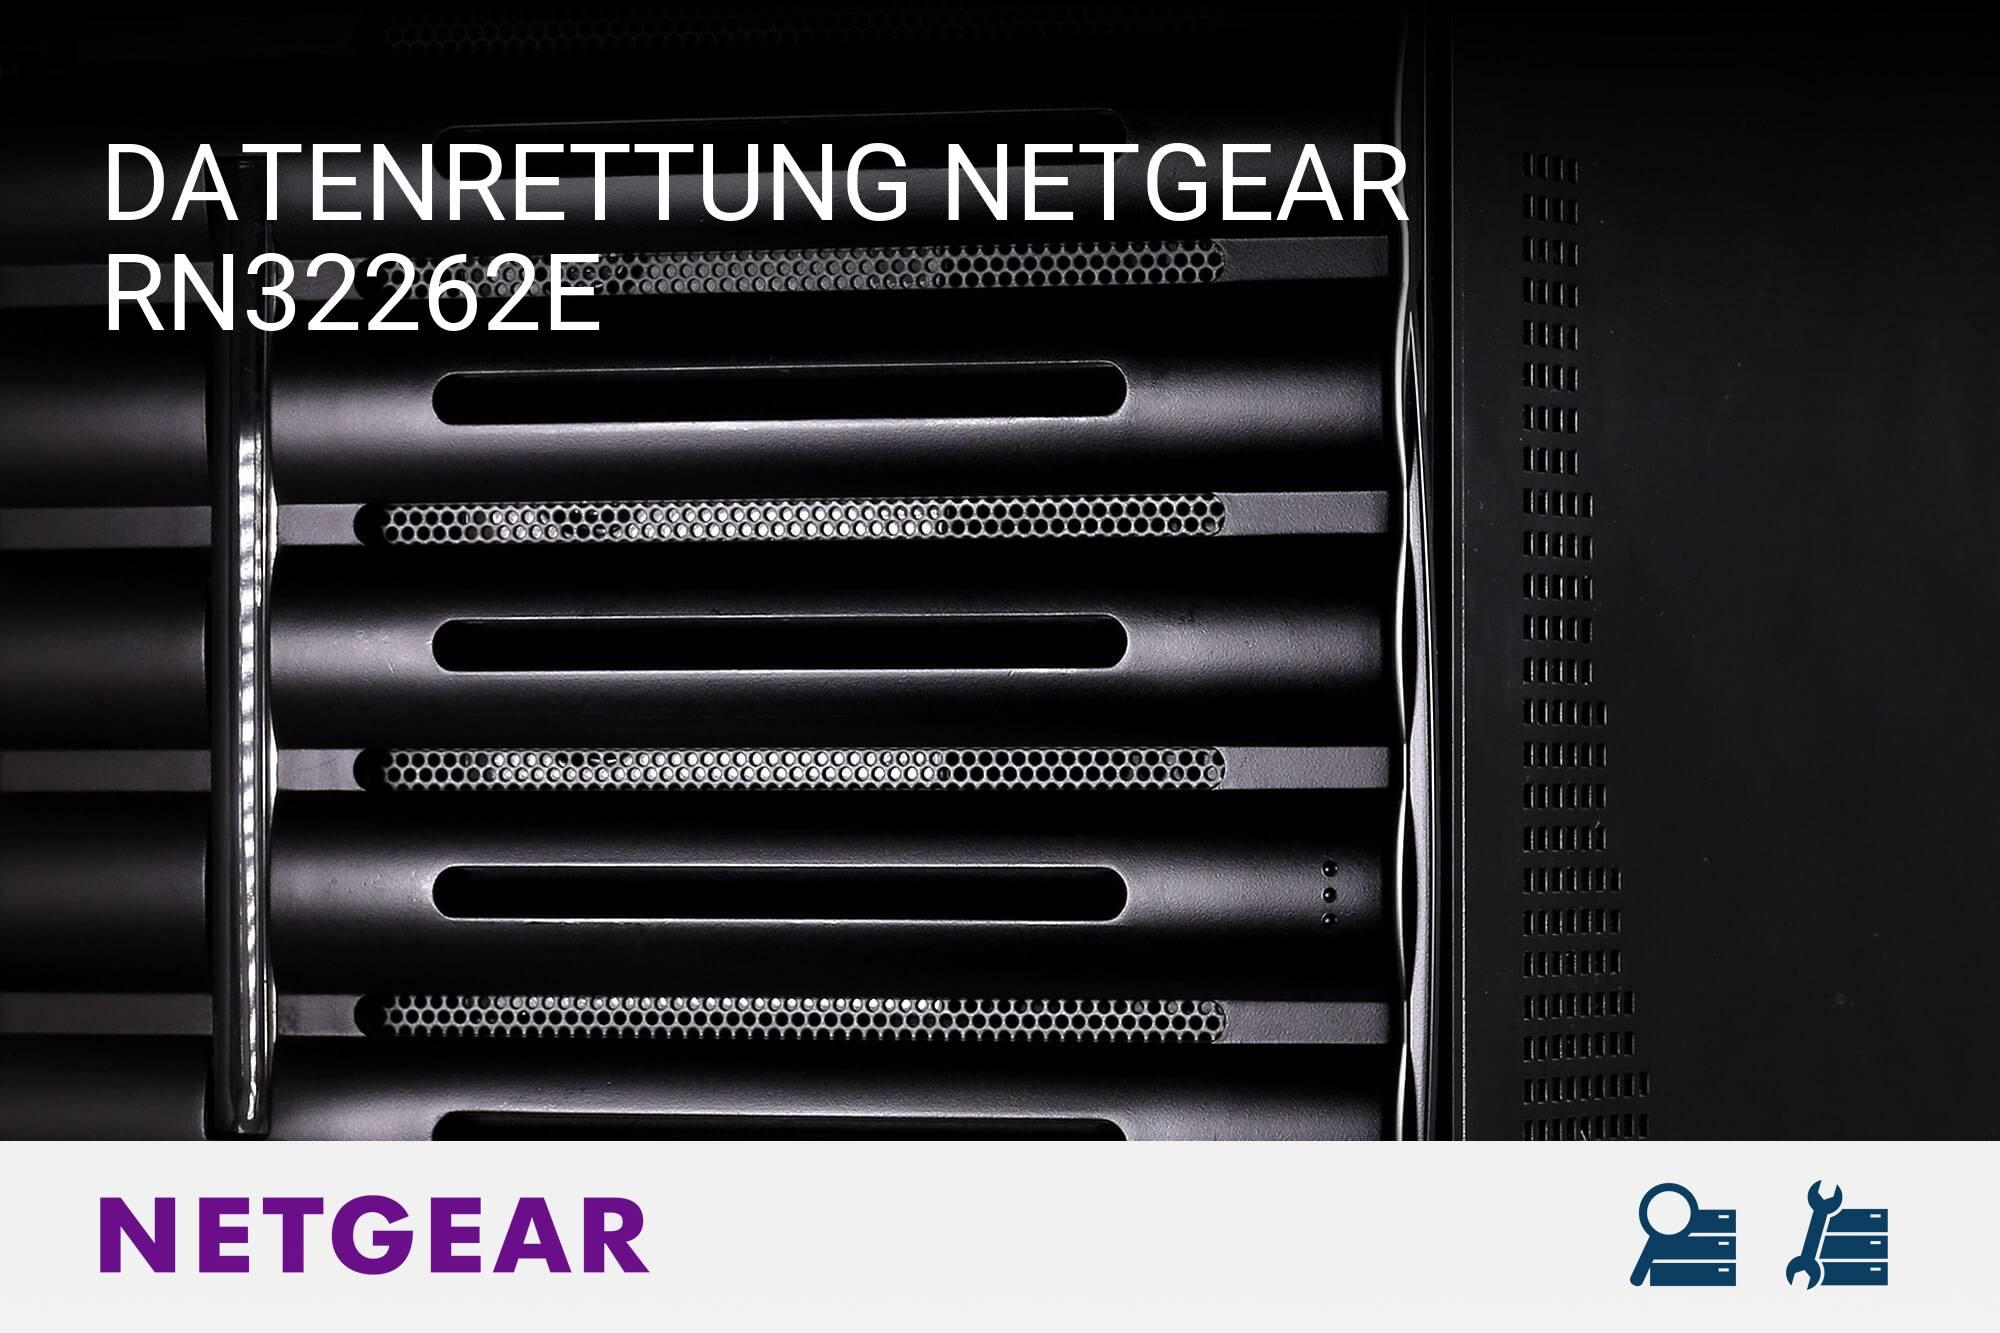 Netgear RN32262E